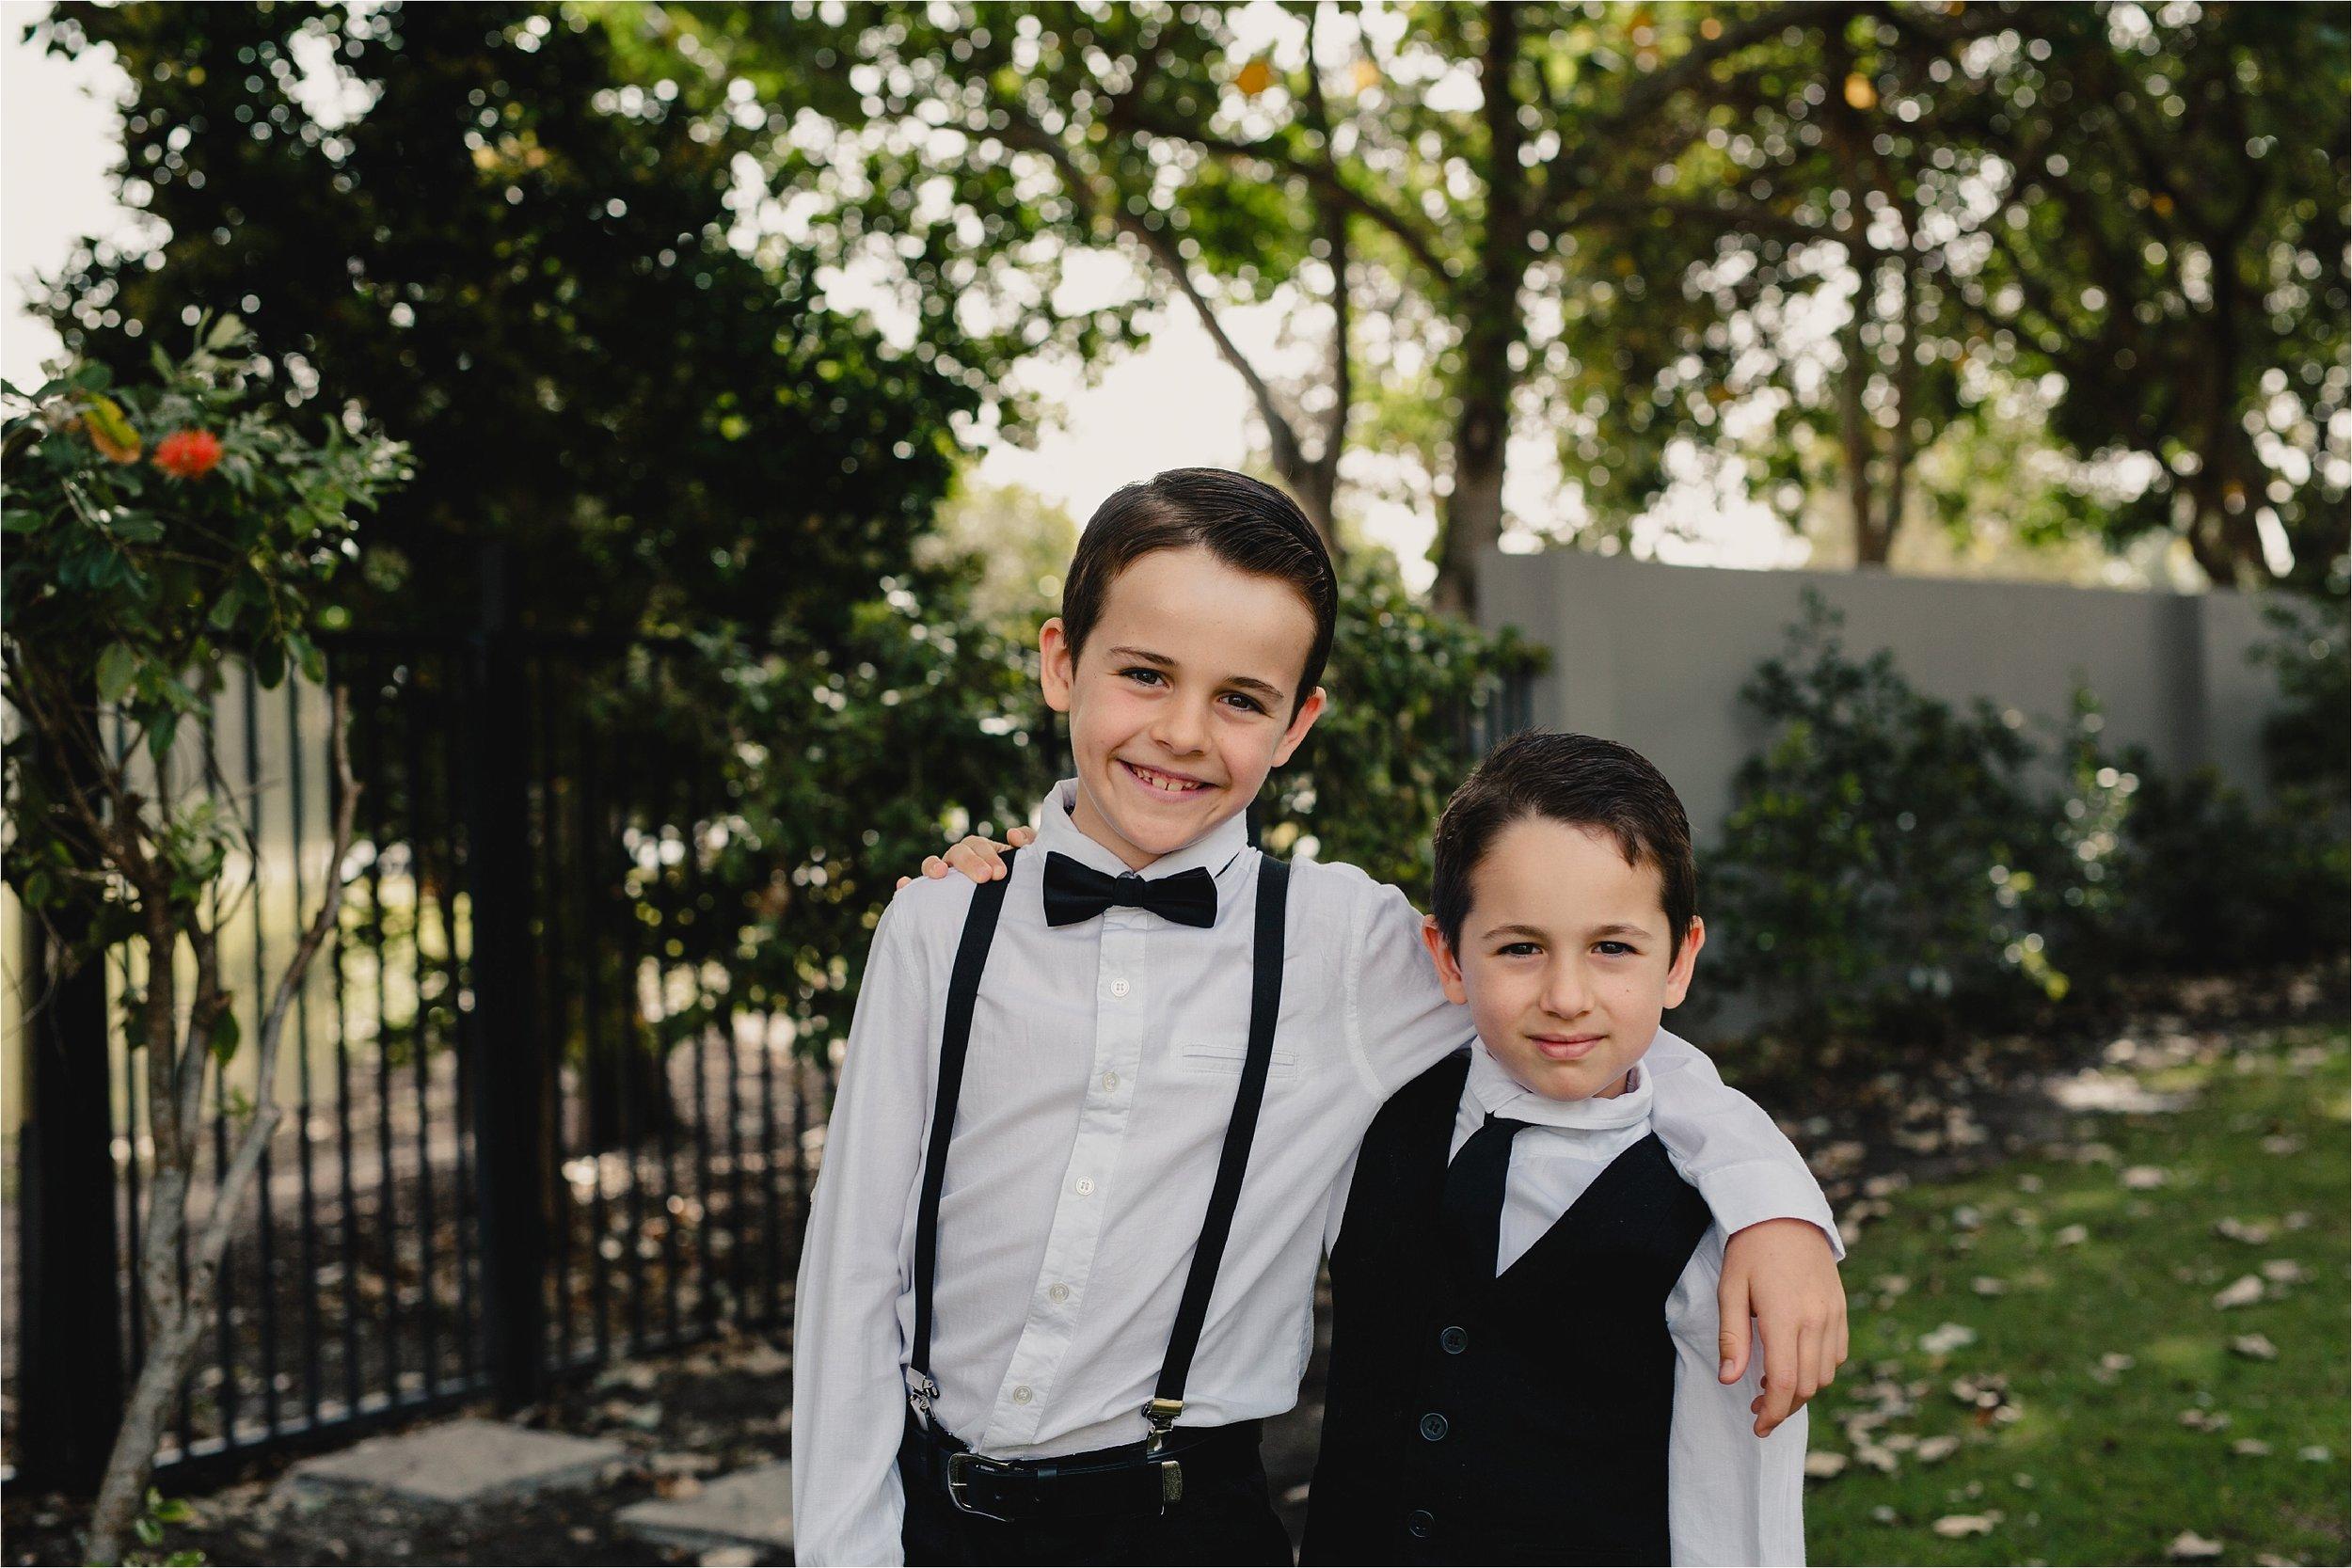 Salt - Wedding - Photography - paigeboys.jpg